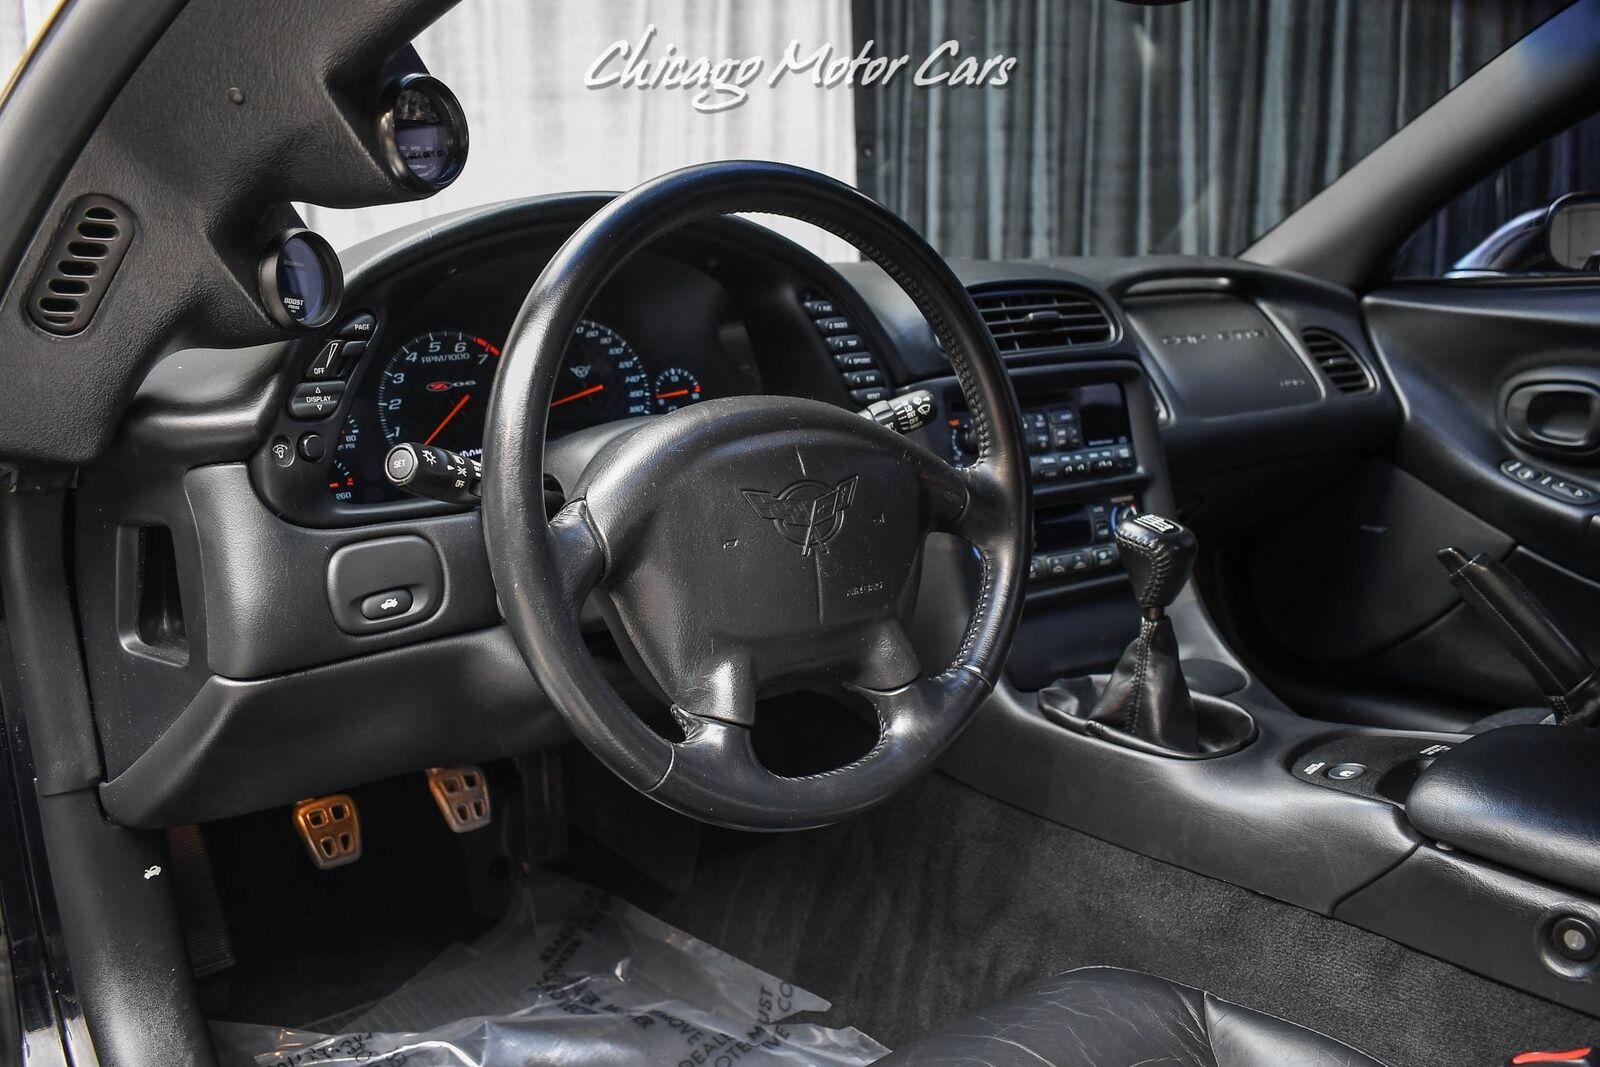 2003 Black Chevrolet Corvette Z06  | C5 Corvette Photo 8